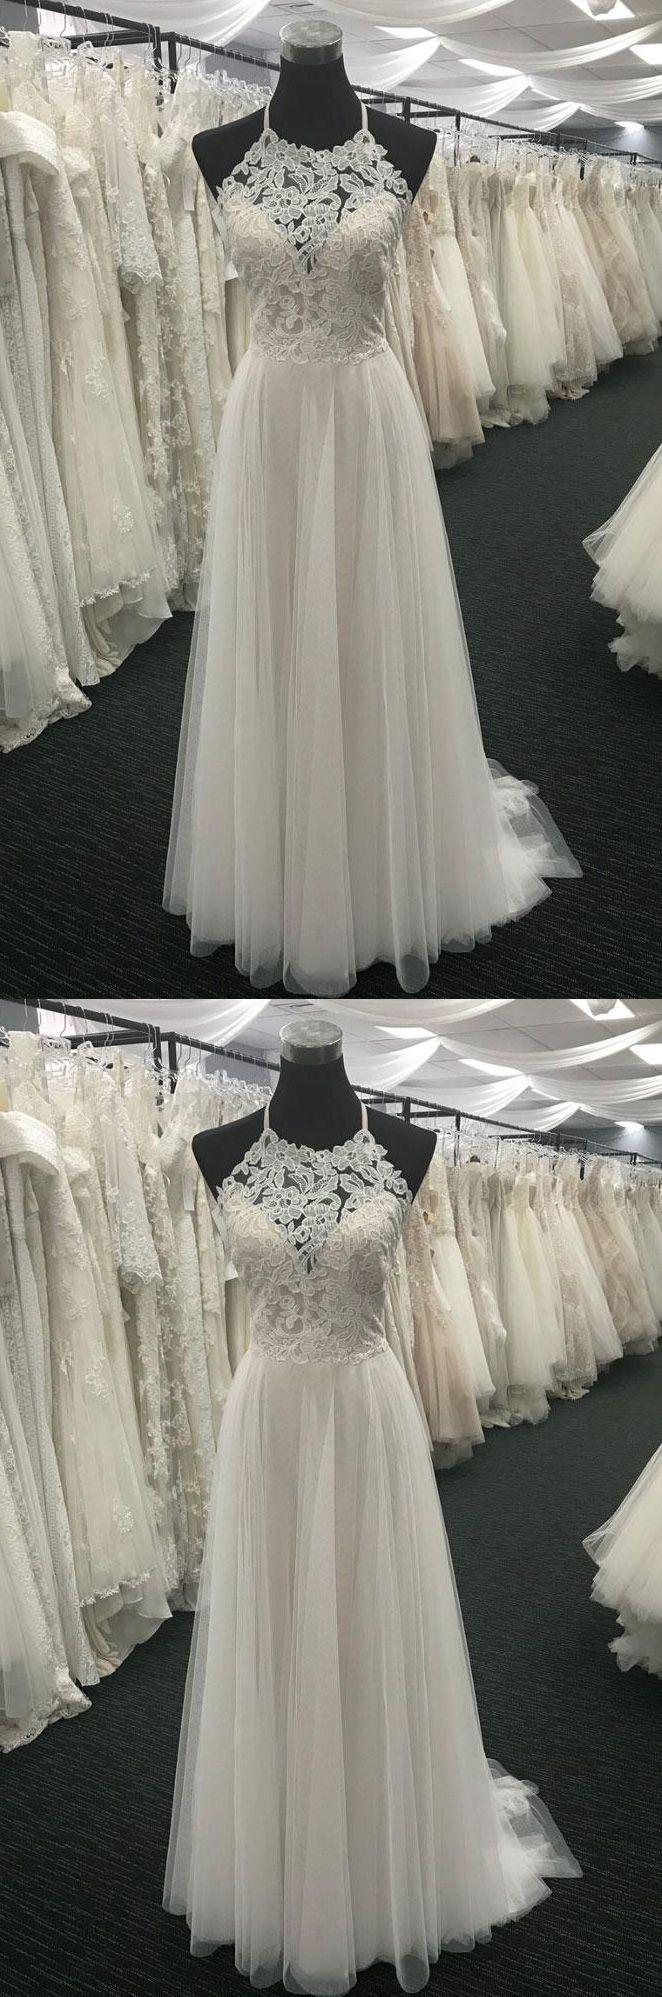 Simple halter long ivory lace prom dresswedding dress dresses